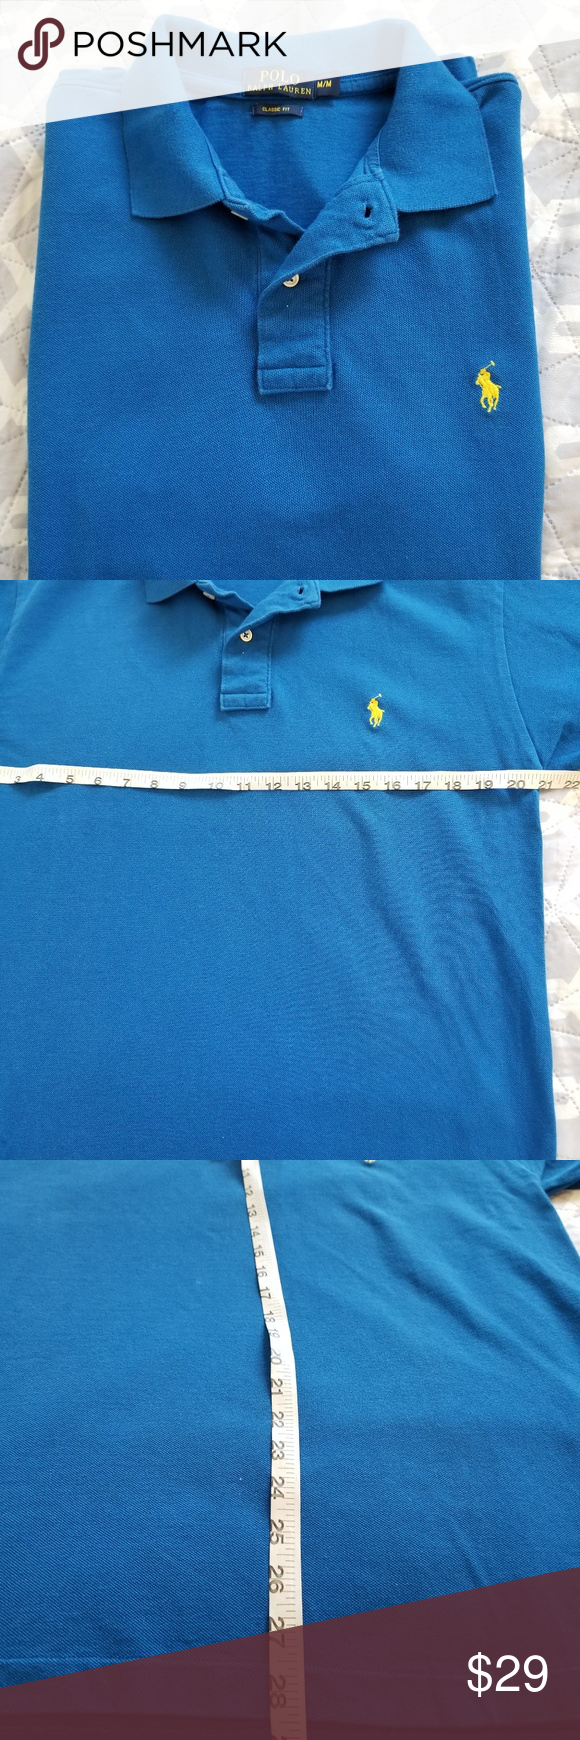 Mens Classic Lauren PoloMedium Ralph Blue Fit Polo Sleeve Short VqLSUMGzjp